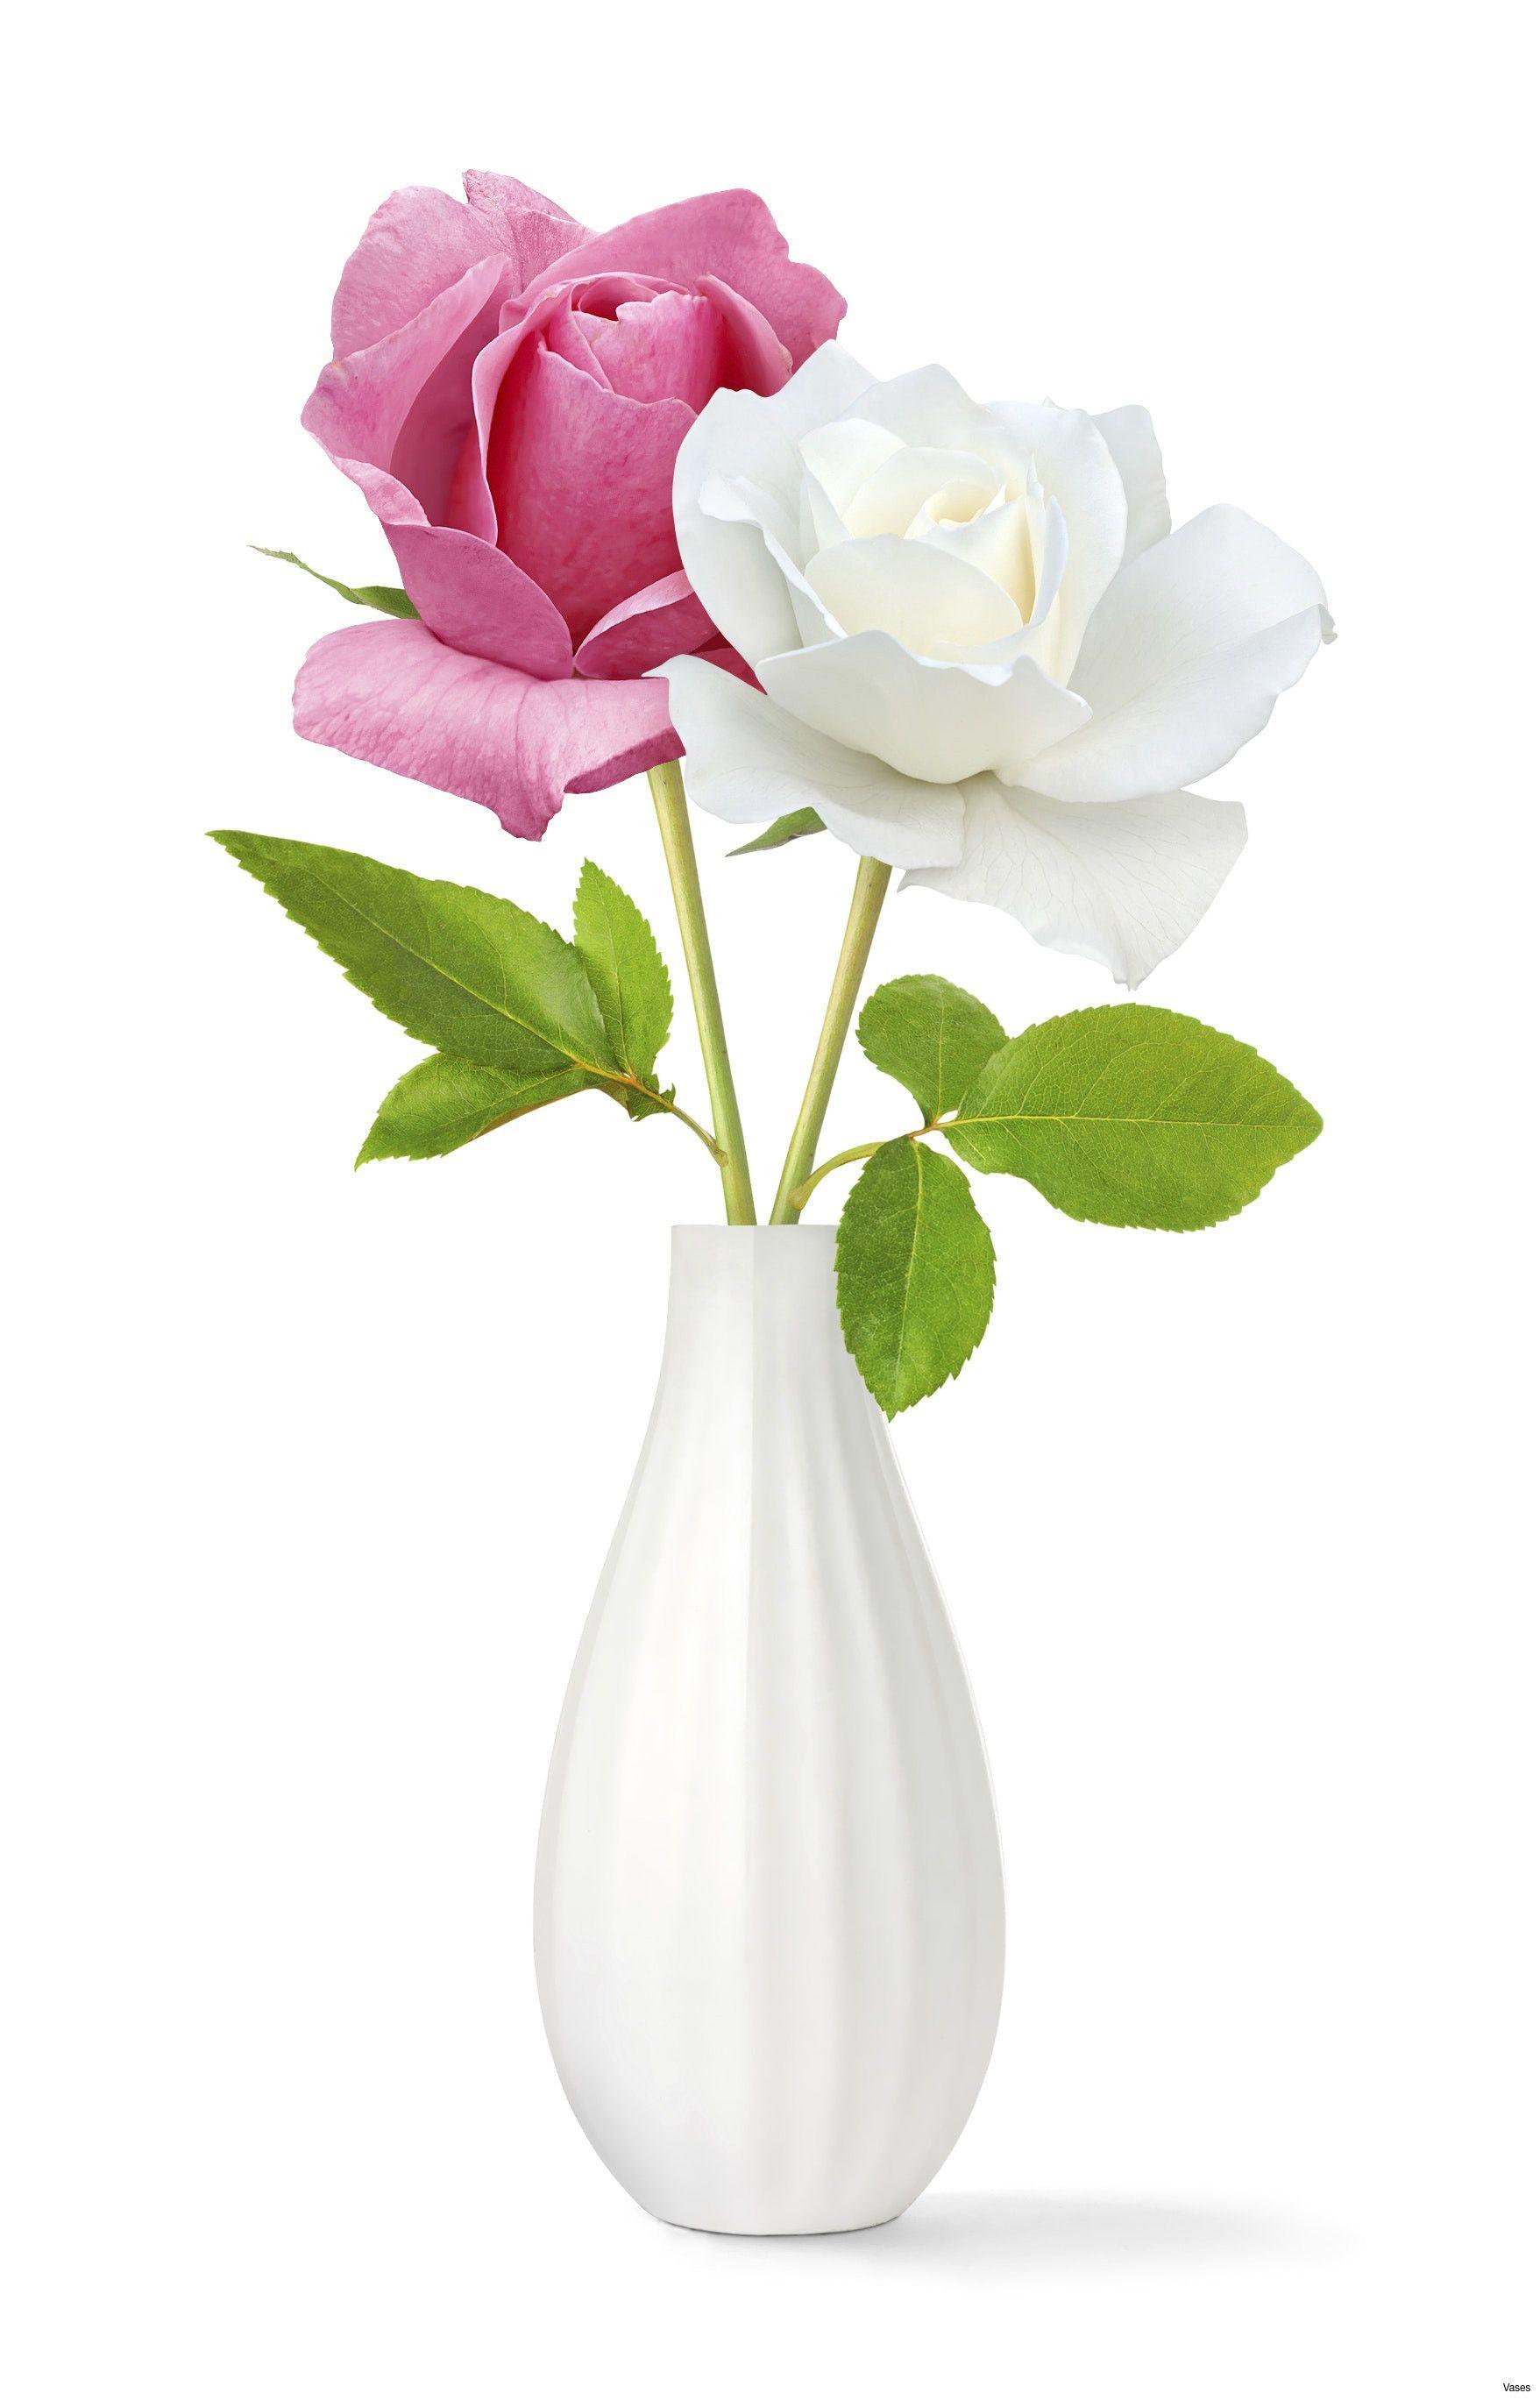 29 Spectacular Cheap Pink Vases 2021 free download cheap pink vases of light pink vase elegant roses red in a vase singleh vases rose regarding light pink vase elegant roses red in a vase singleh vases rose single i 0d scheme